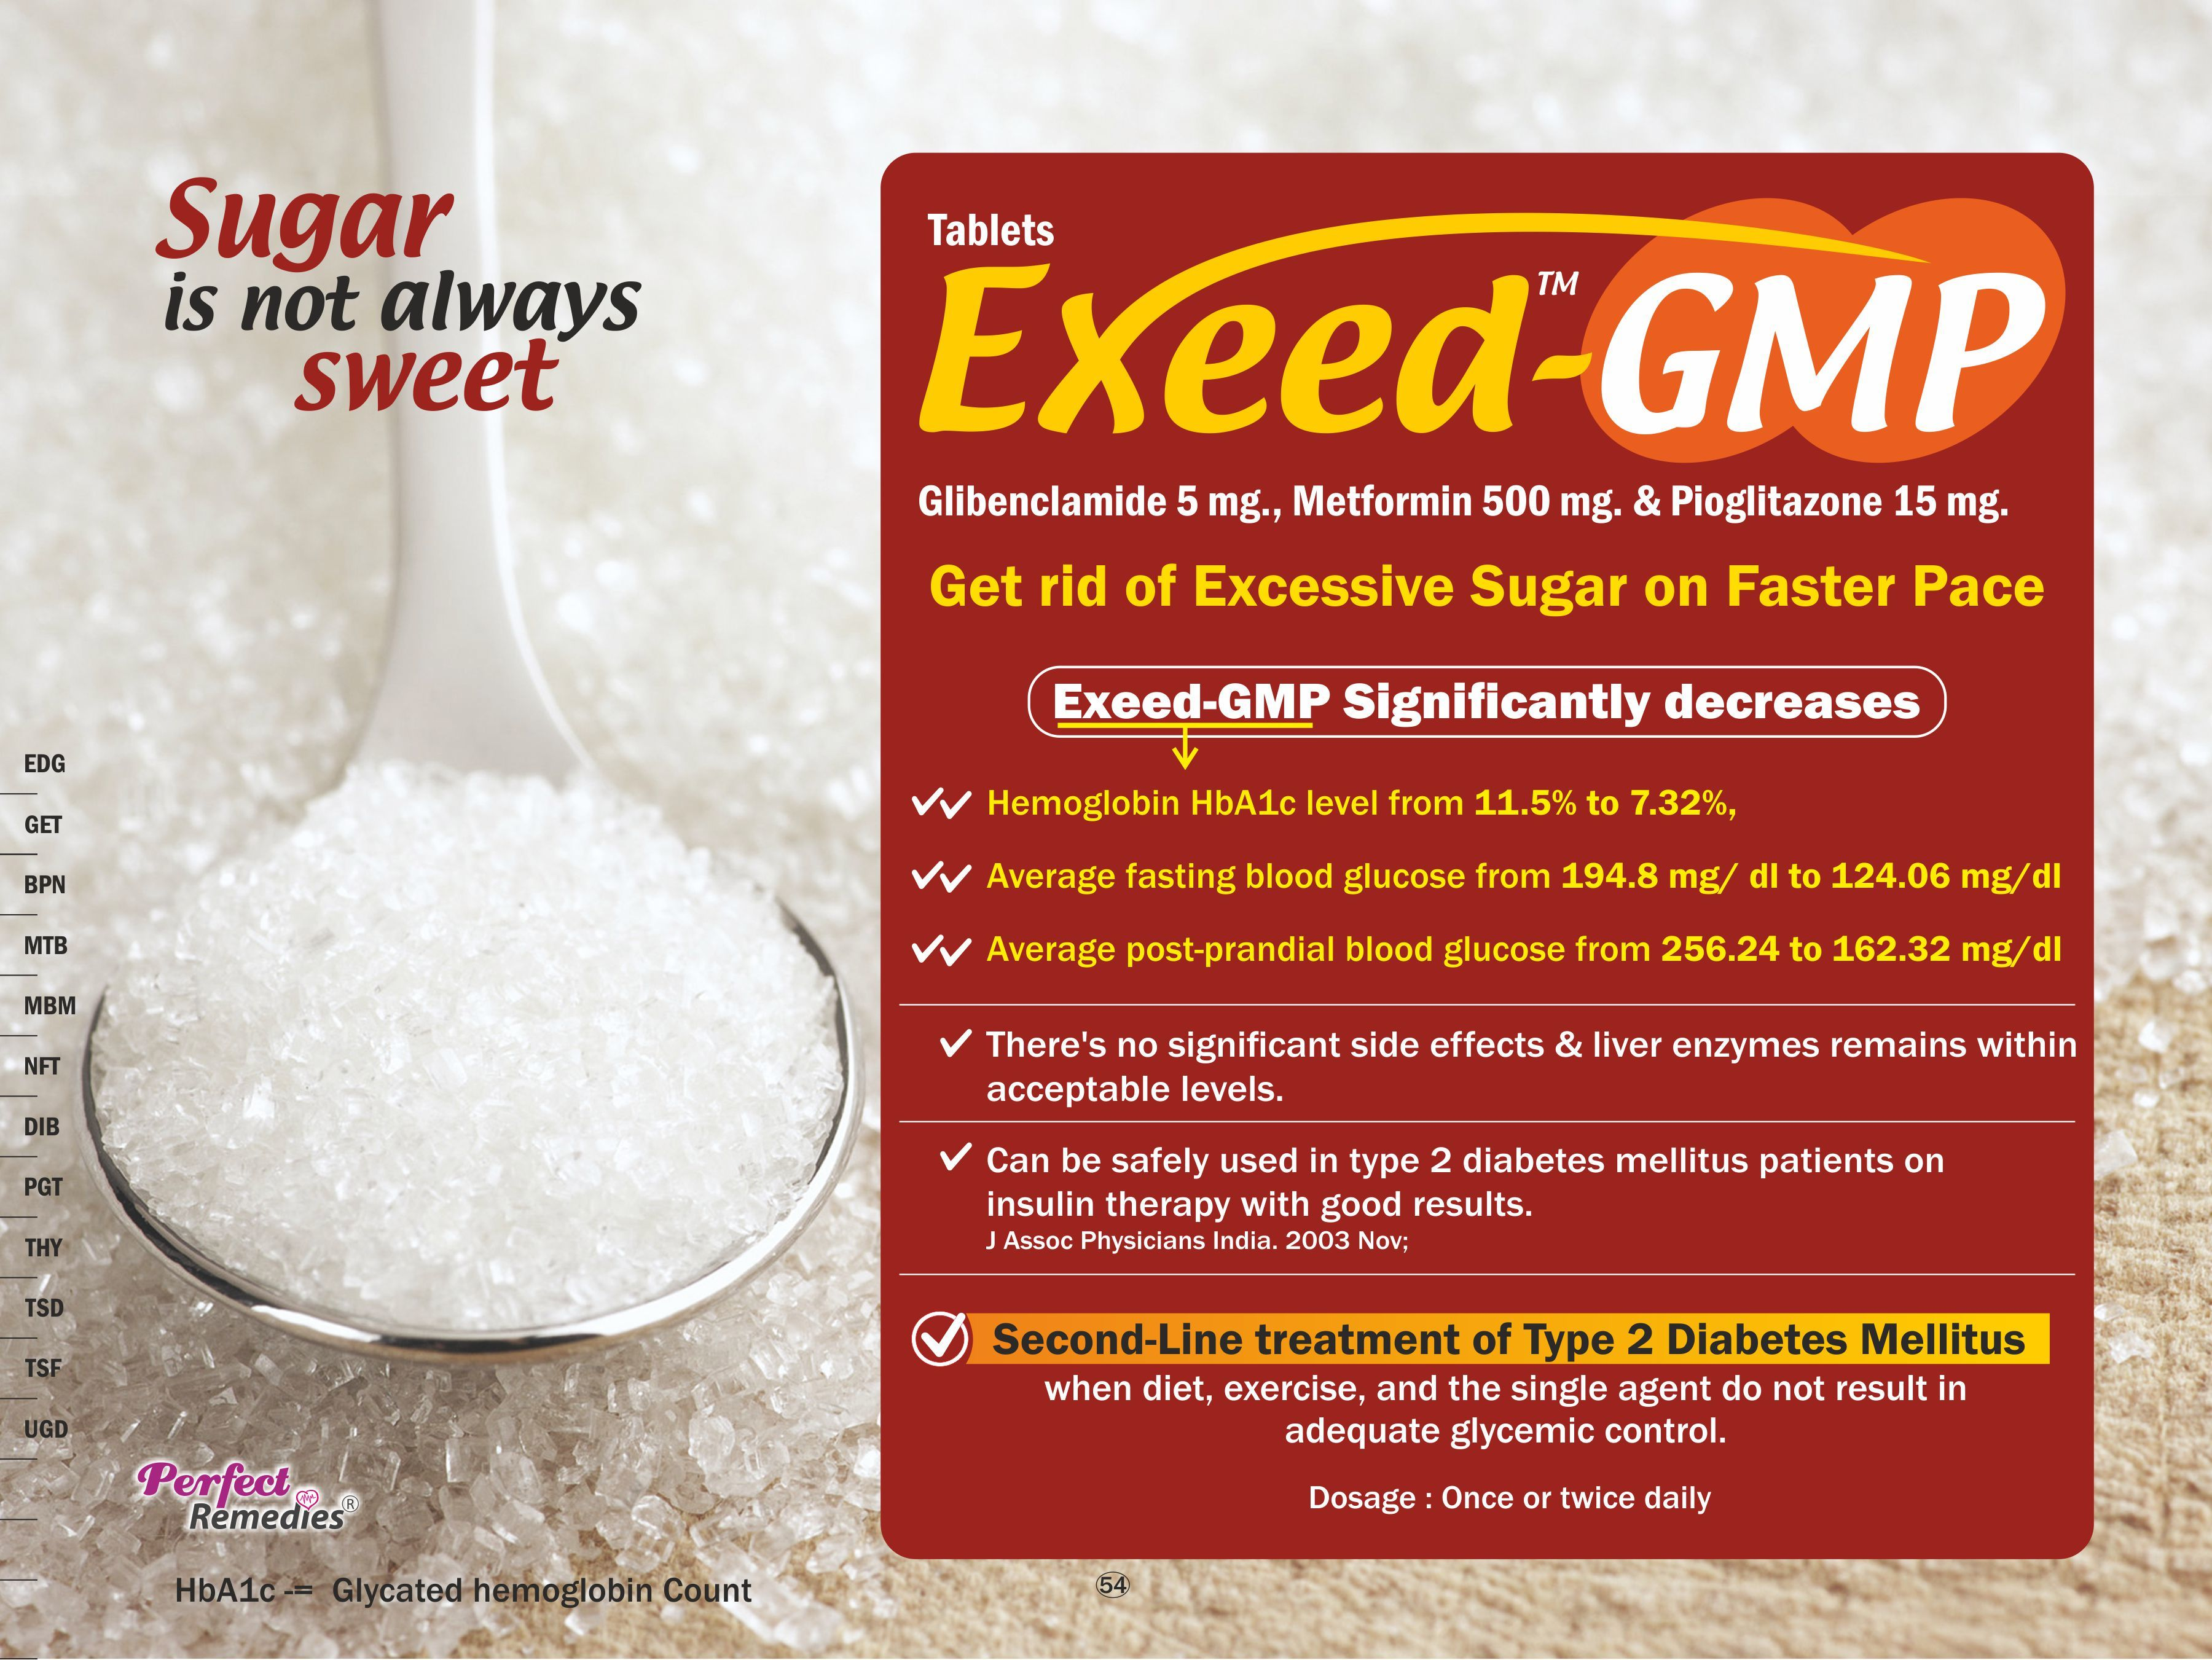 Metformin-500 mg, Glibenclamide 5 mg & Pioglitazone 15 mg